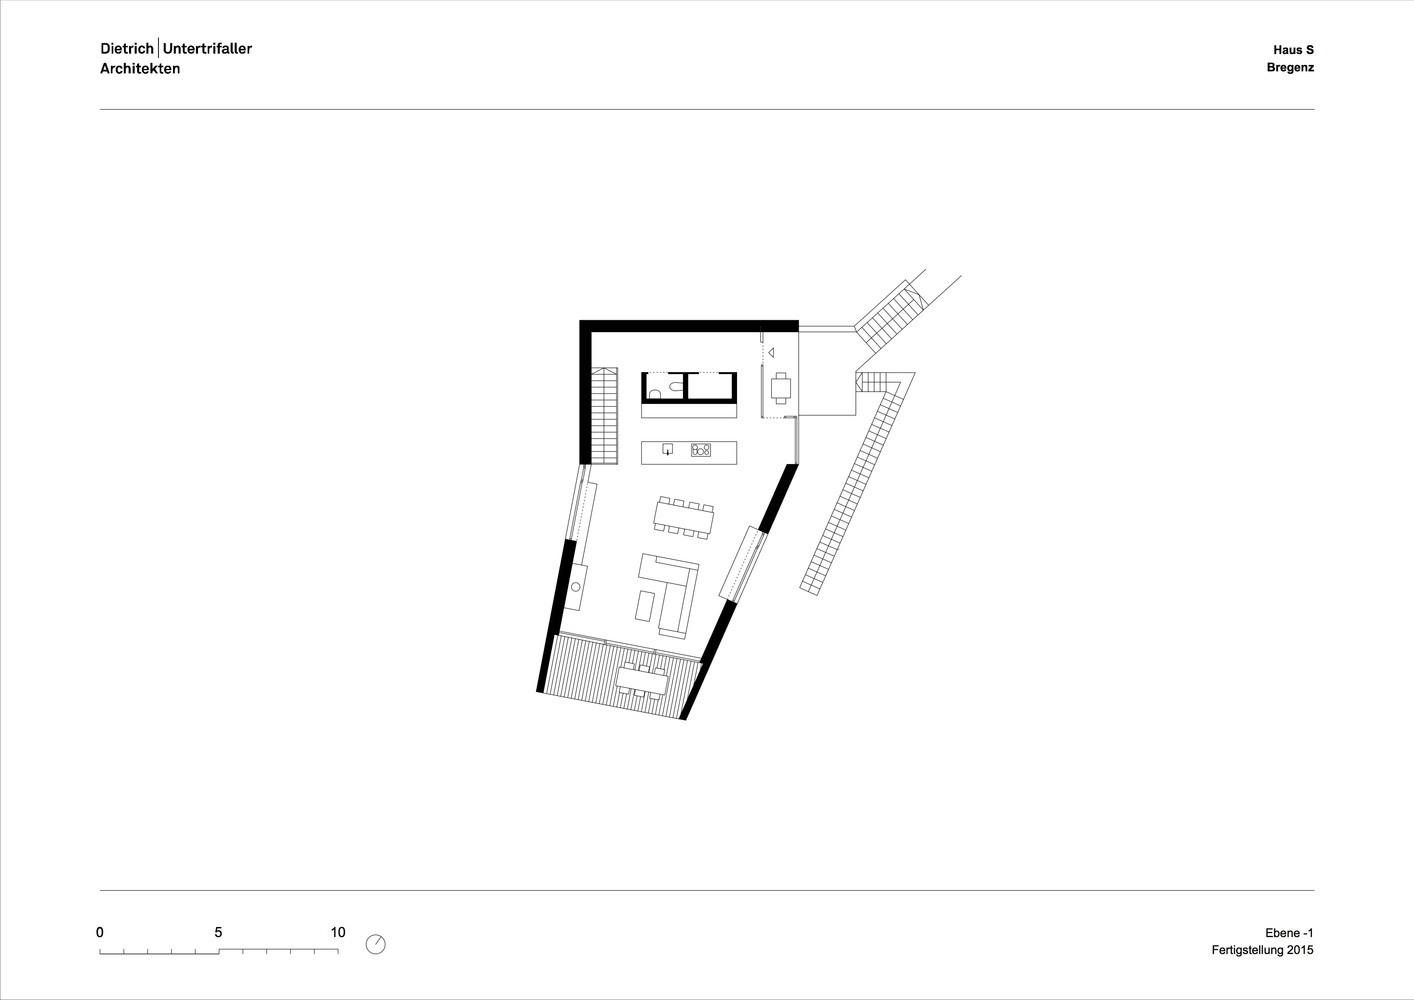 Gallery of House Sch / Dietrich | Untertrifaller Architects - 11